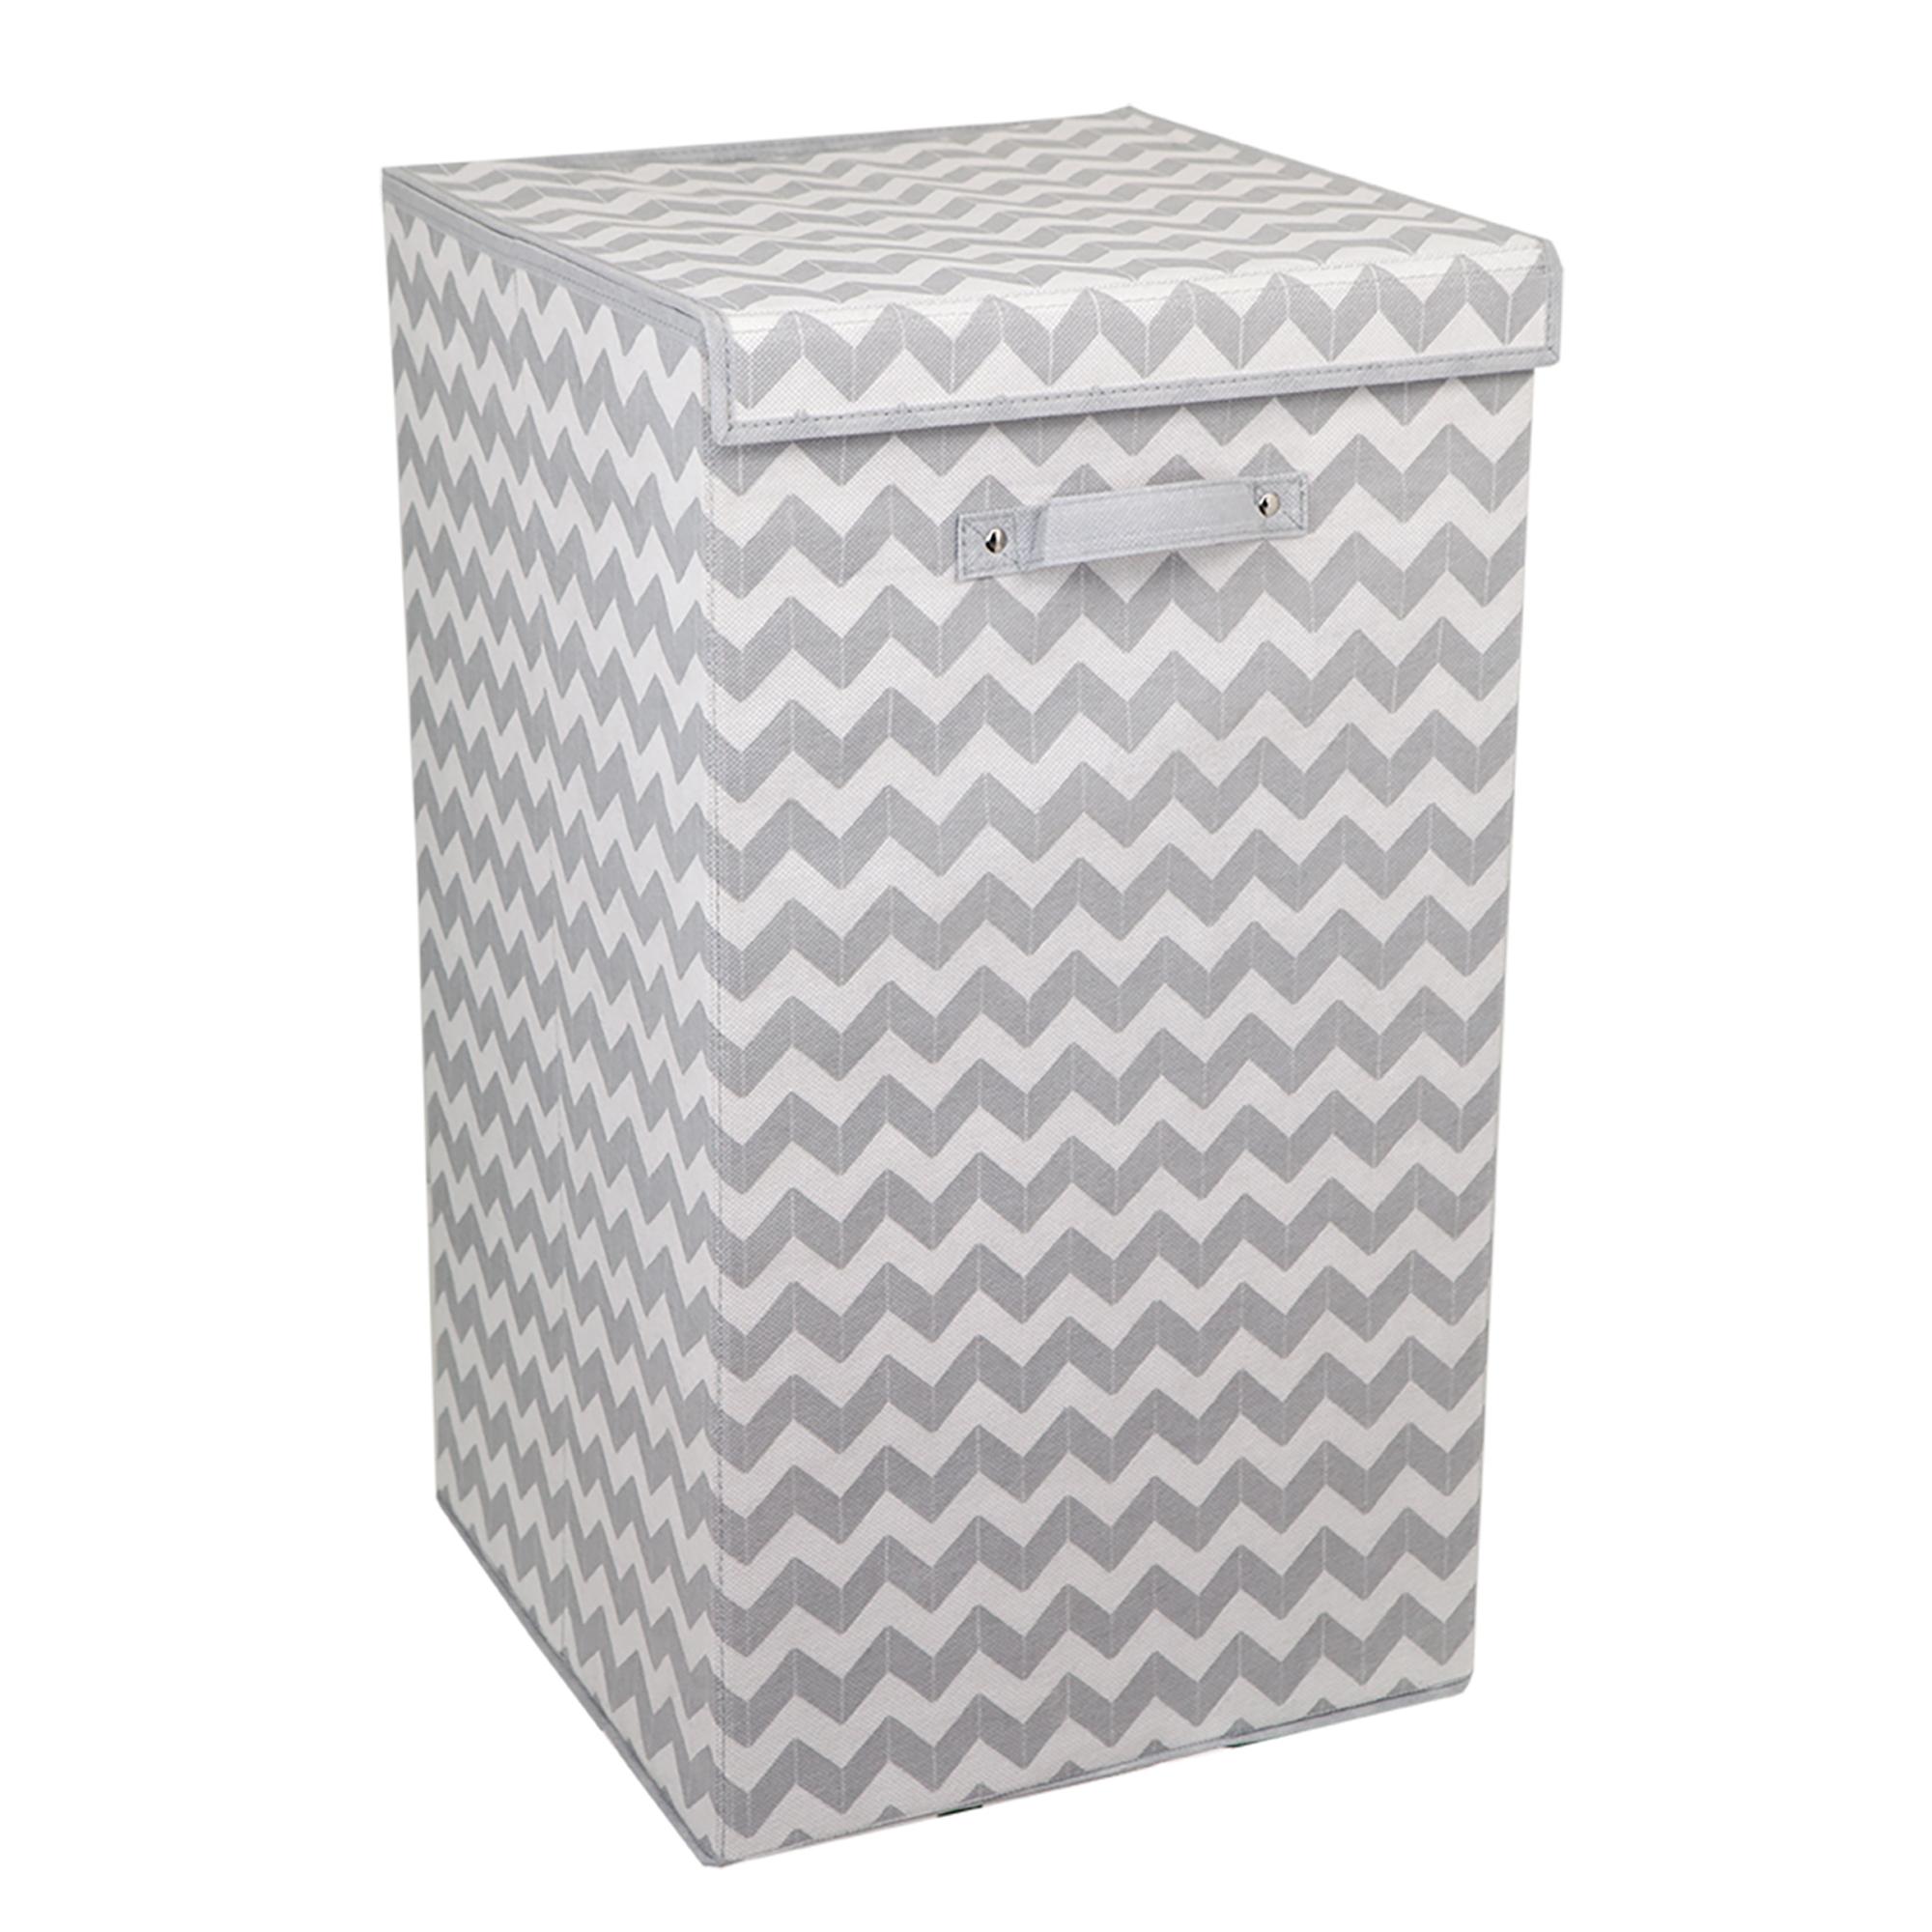 Home Basics Gray and White Chevron Folding Laundry Hamper